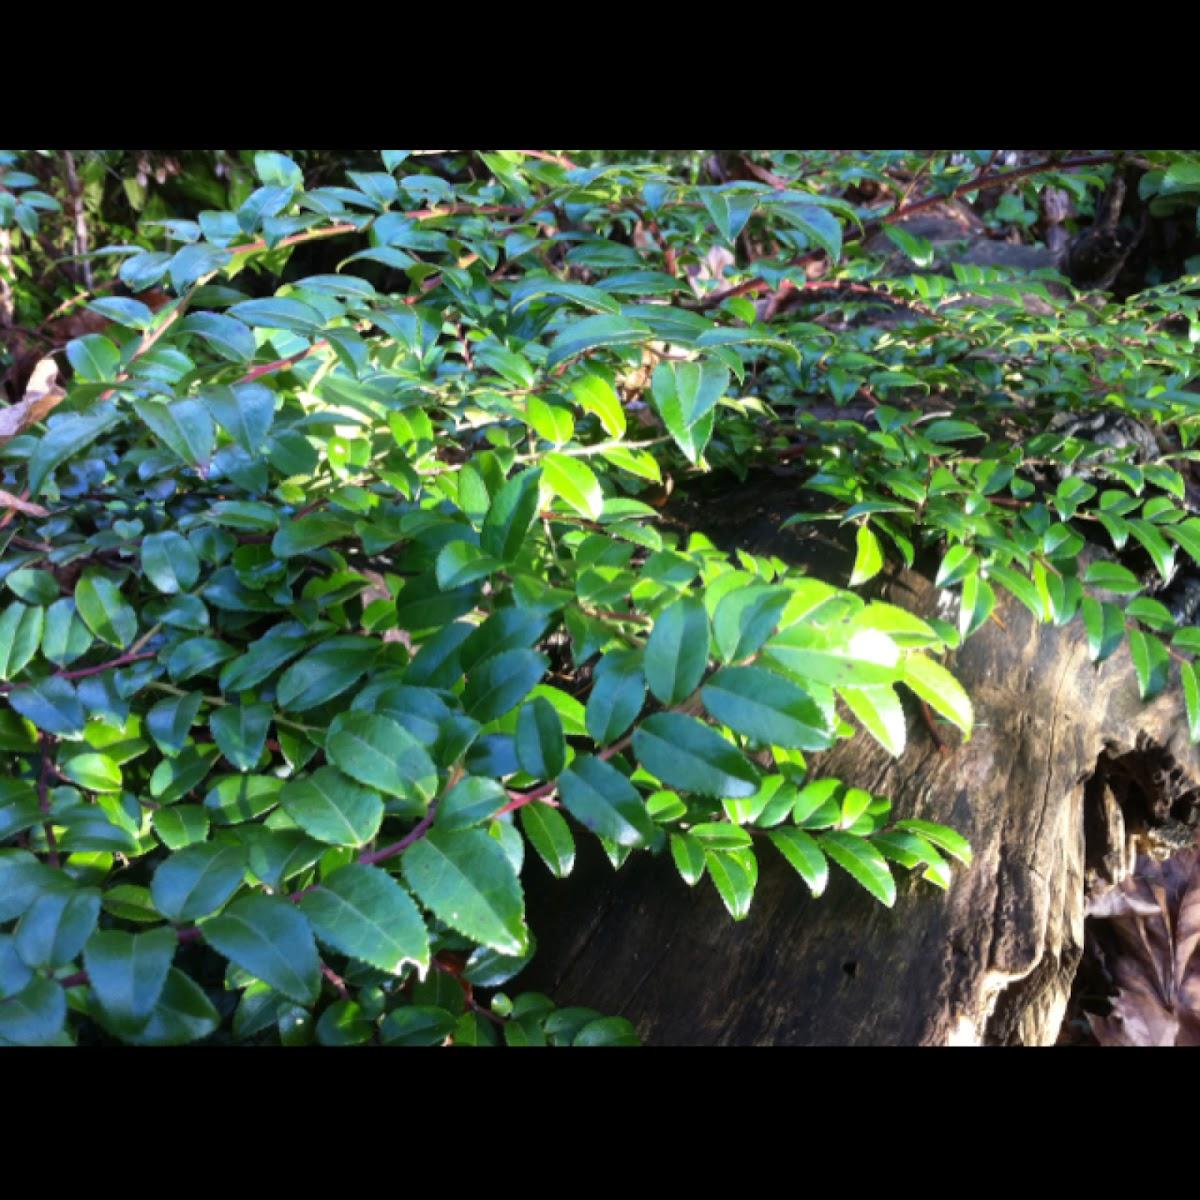 Evergreen huckleberry